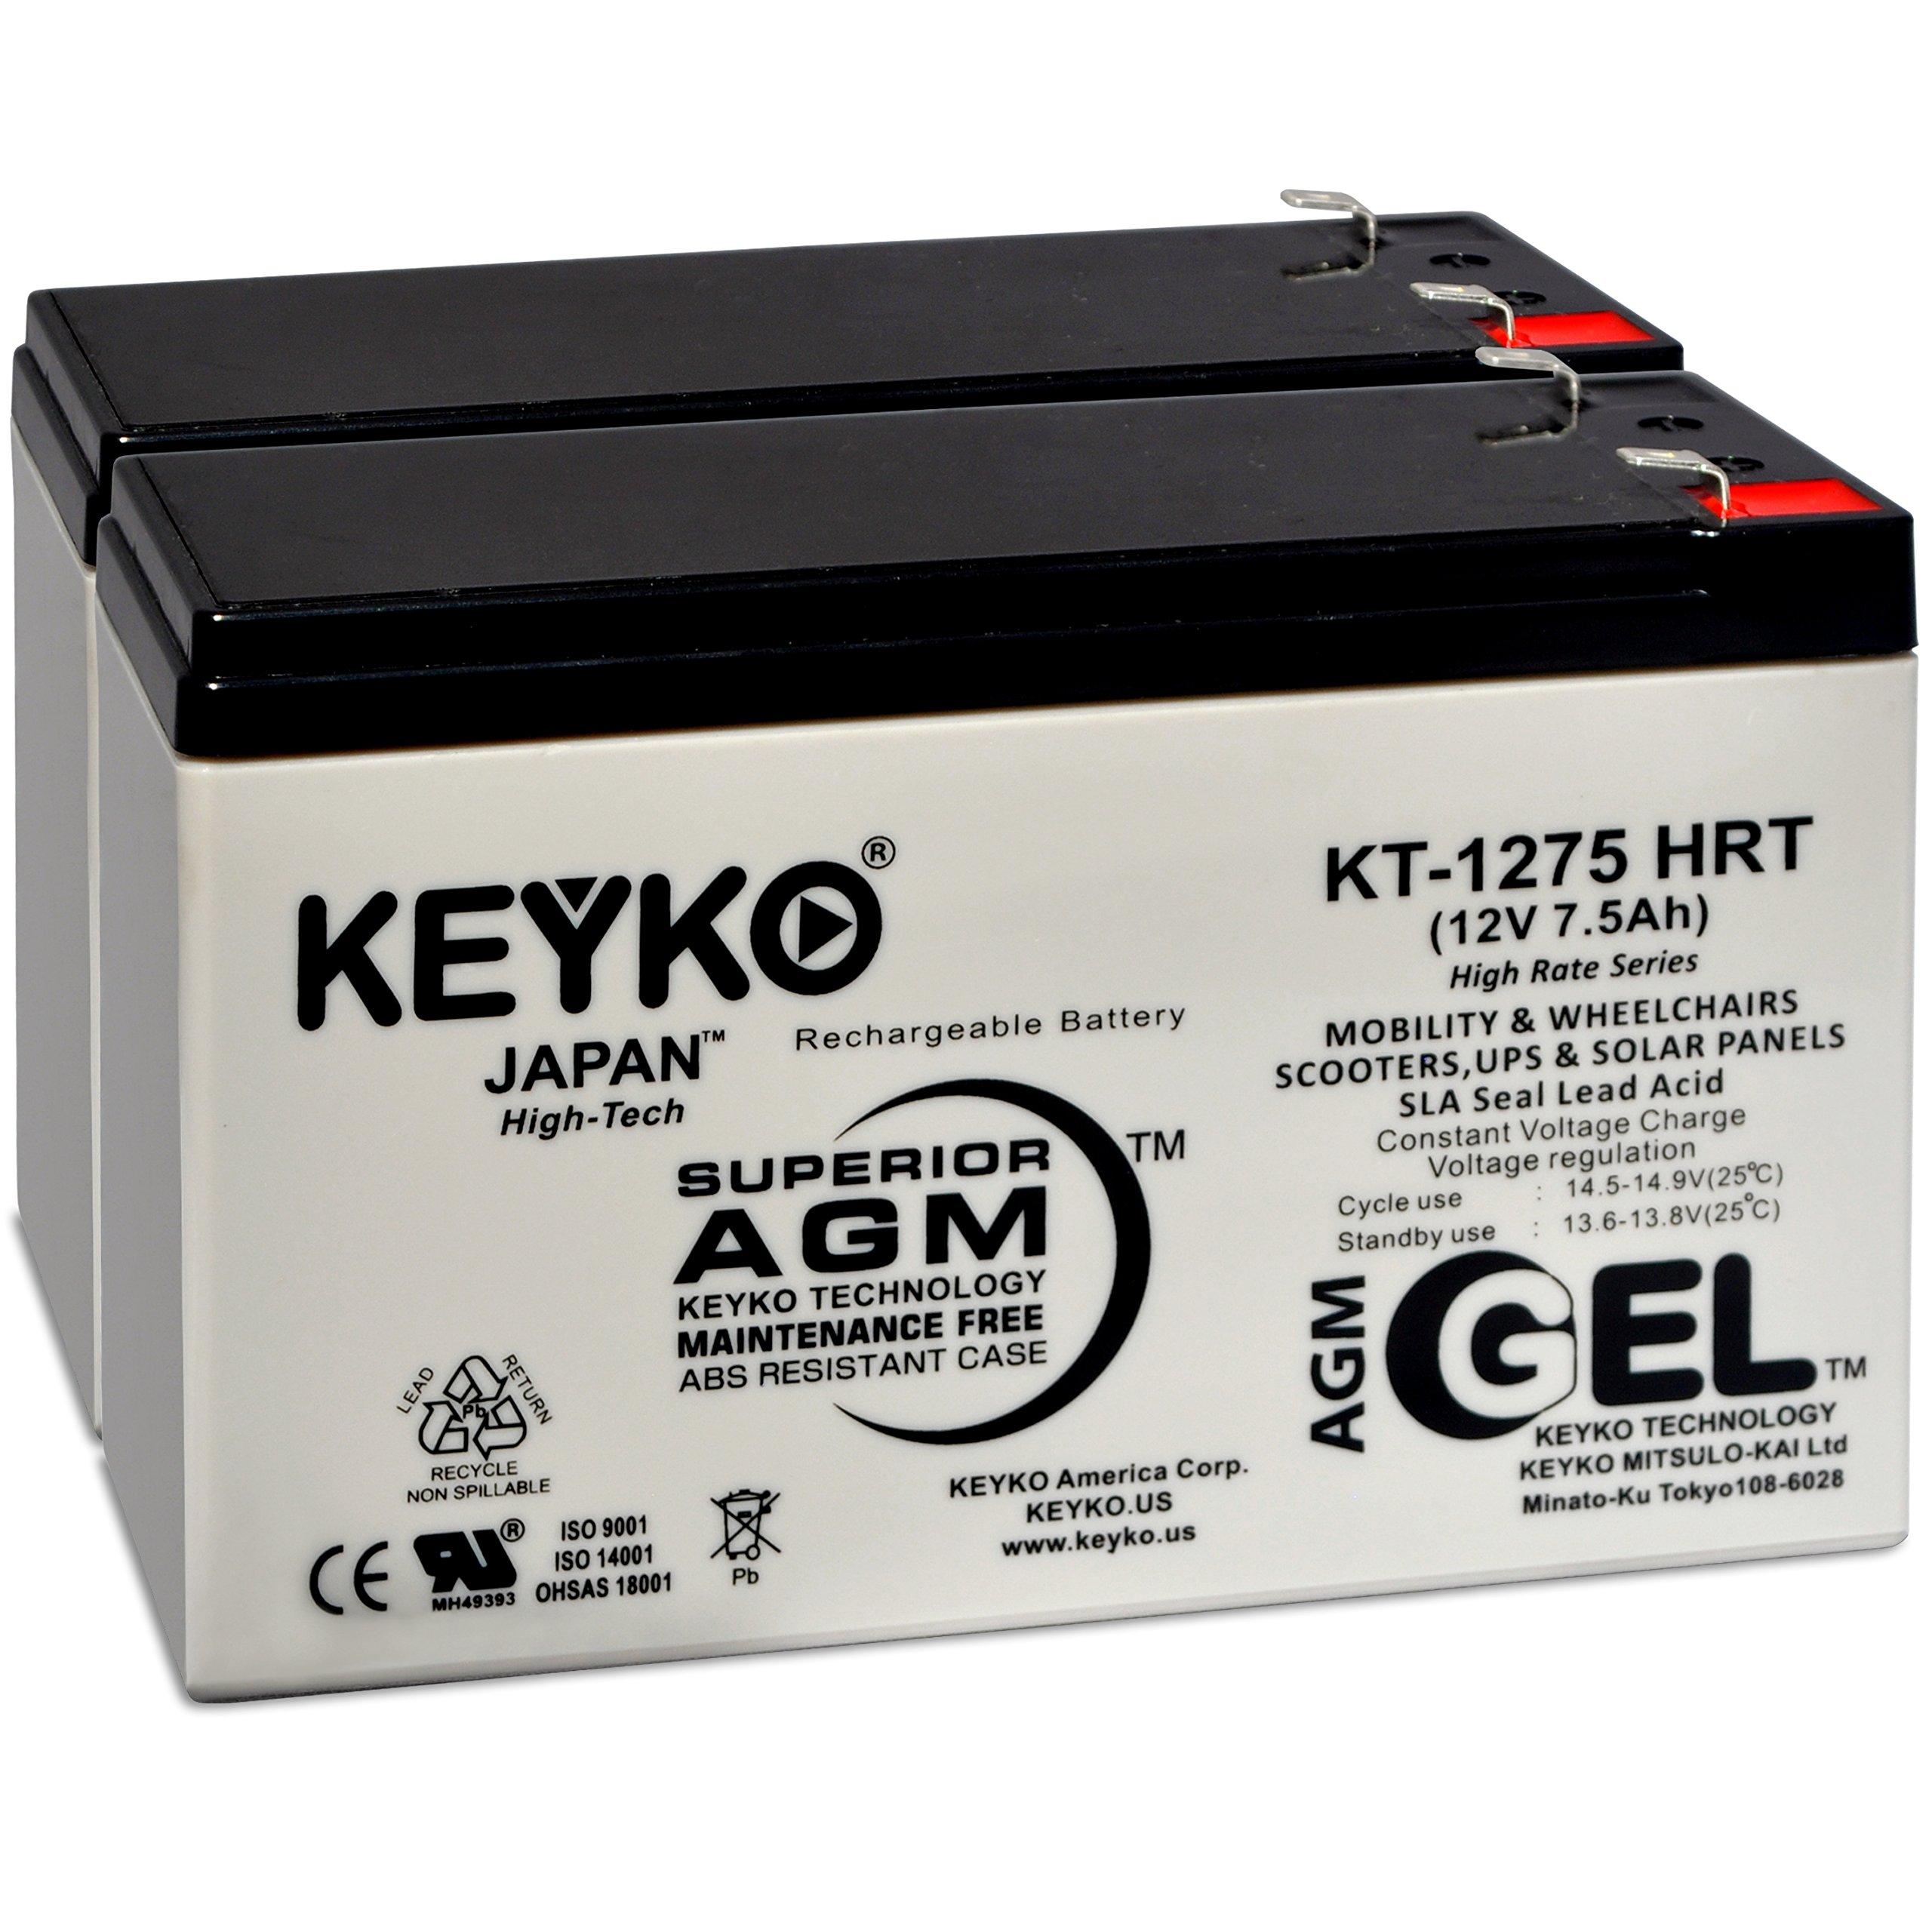 Razor 6-DW-7 12V 7.5 Ah Battery - Fresh & Real 8 Amp - Gel Deep Cycle AGM/SLA Seal Lead Acid Designed for Scooter - Genuine KEYKO - F2 Terminal W/F1 Adapter - 2 Pack